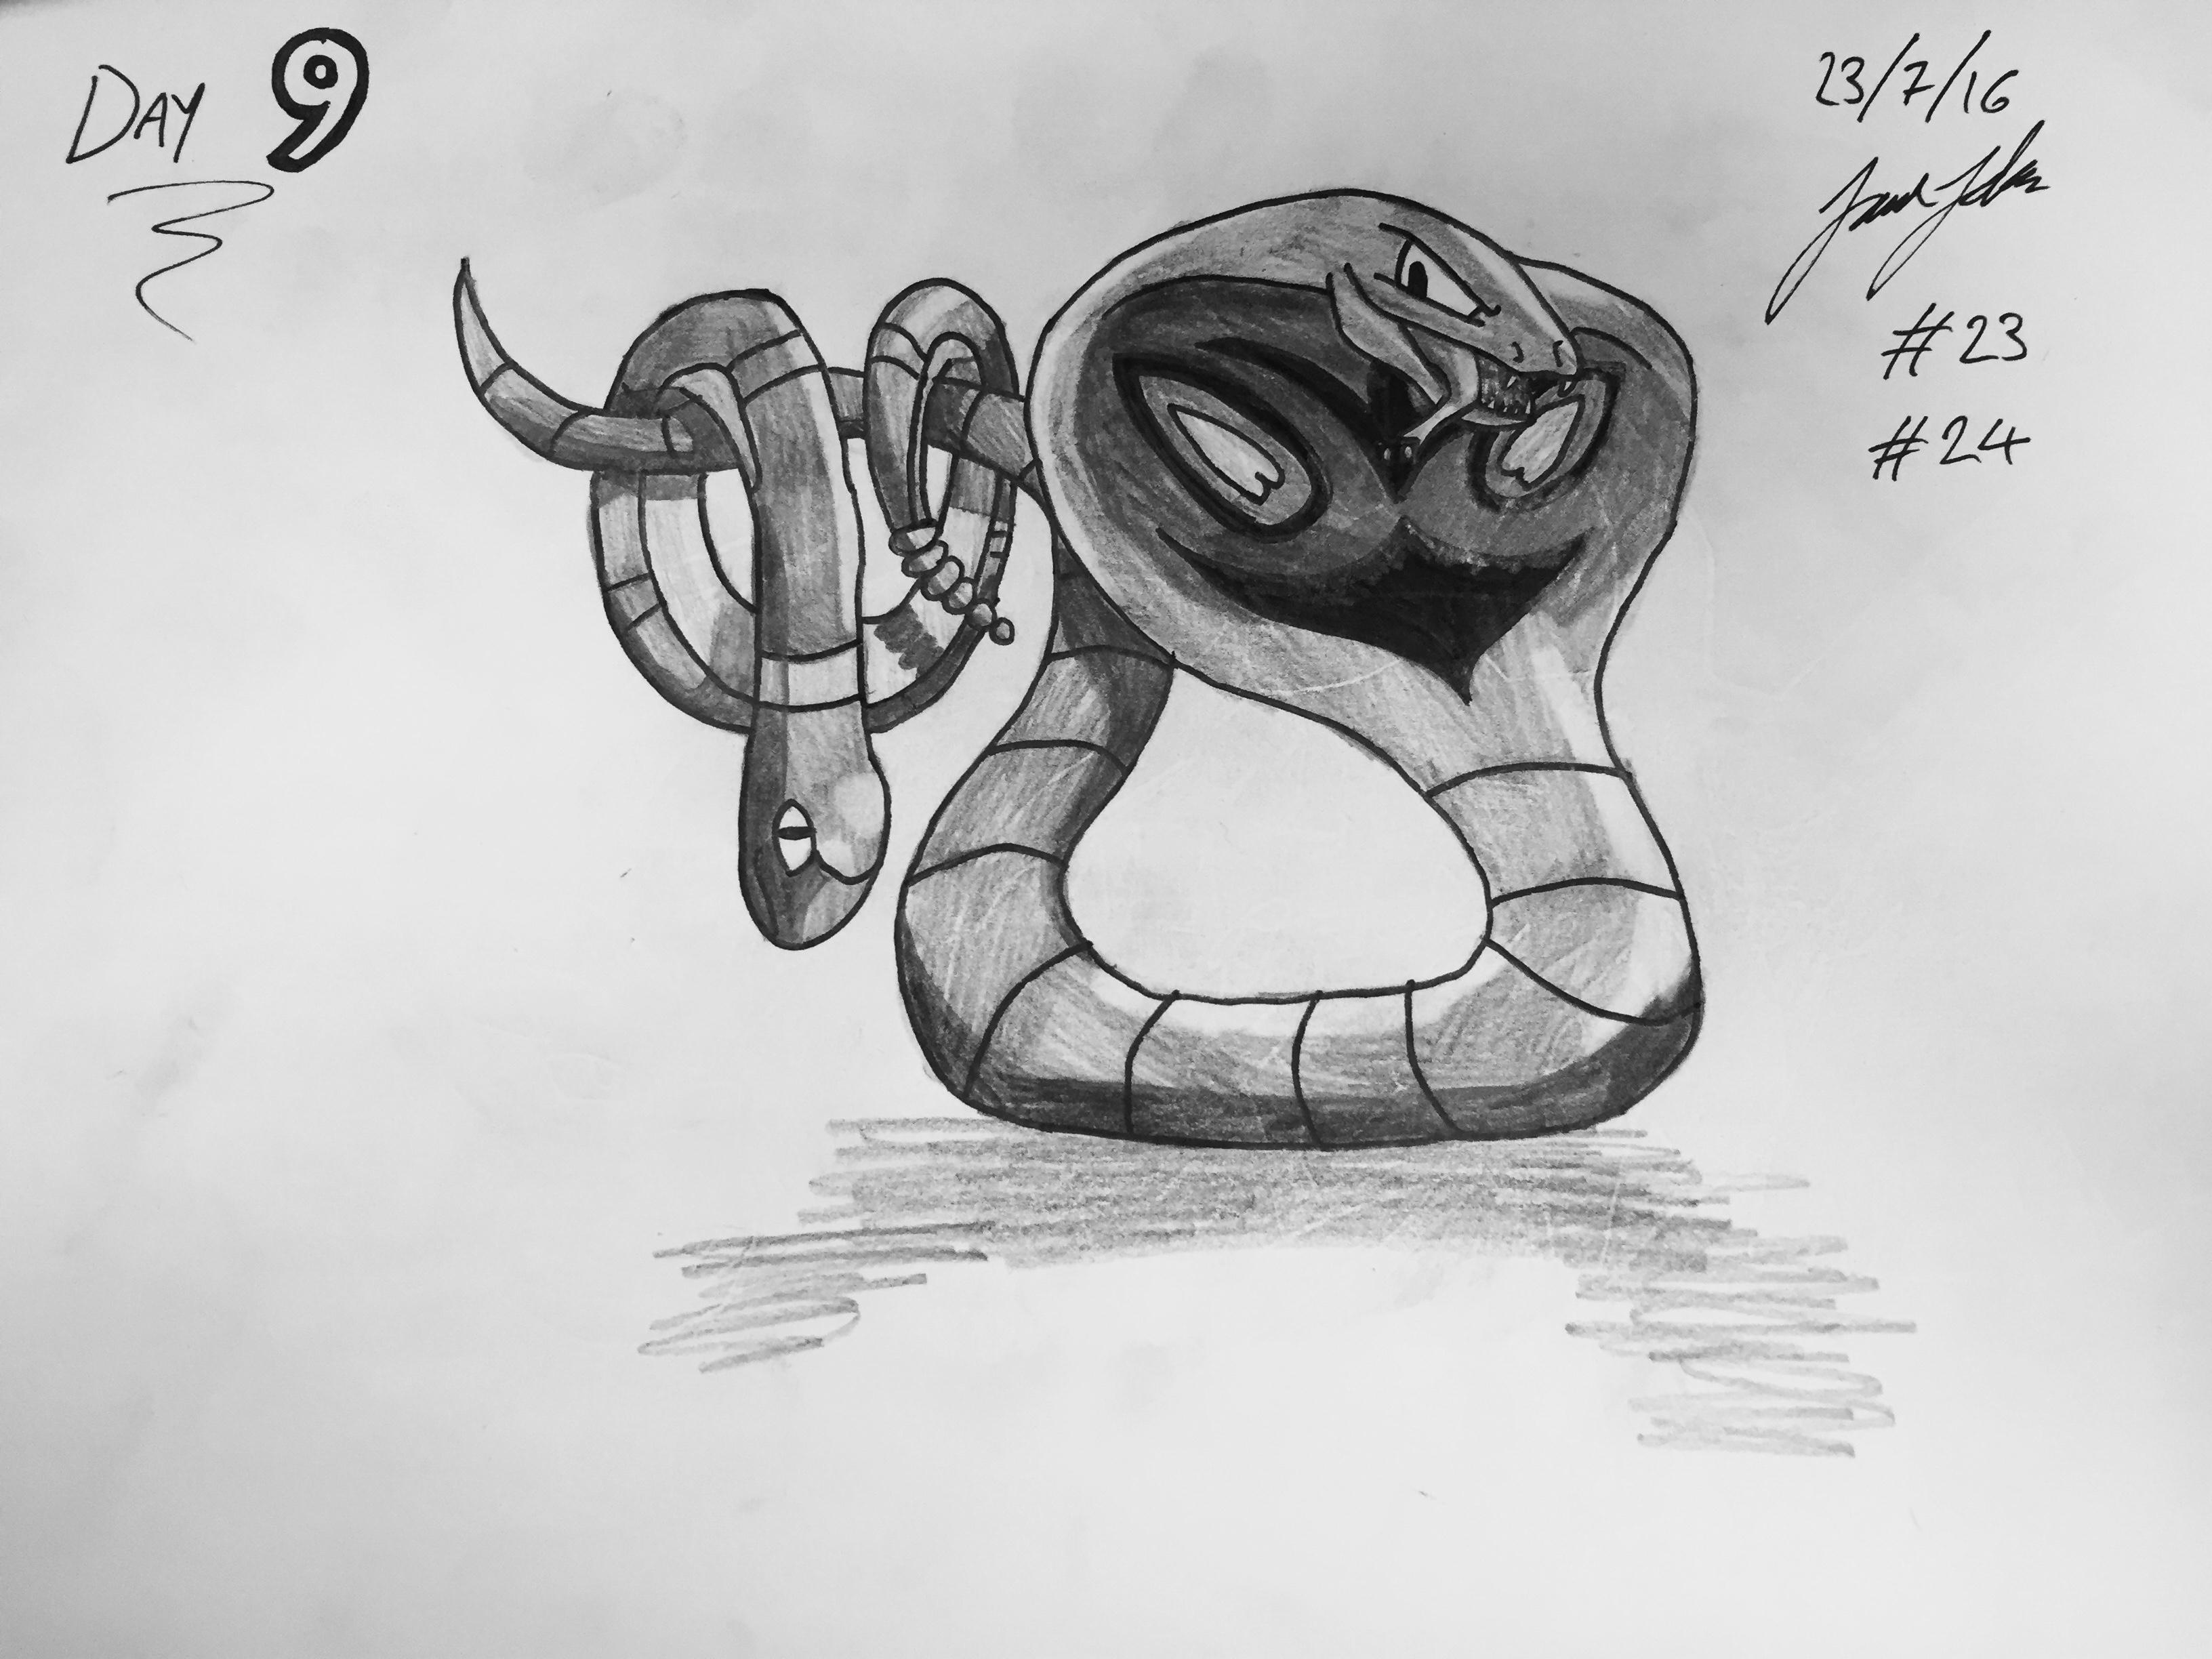 #23 Ekans #24 Arbok